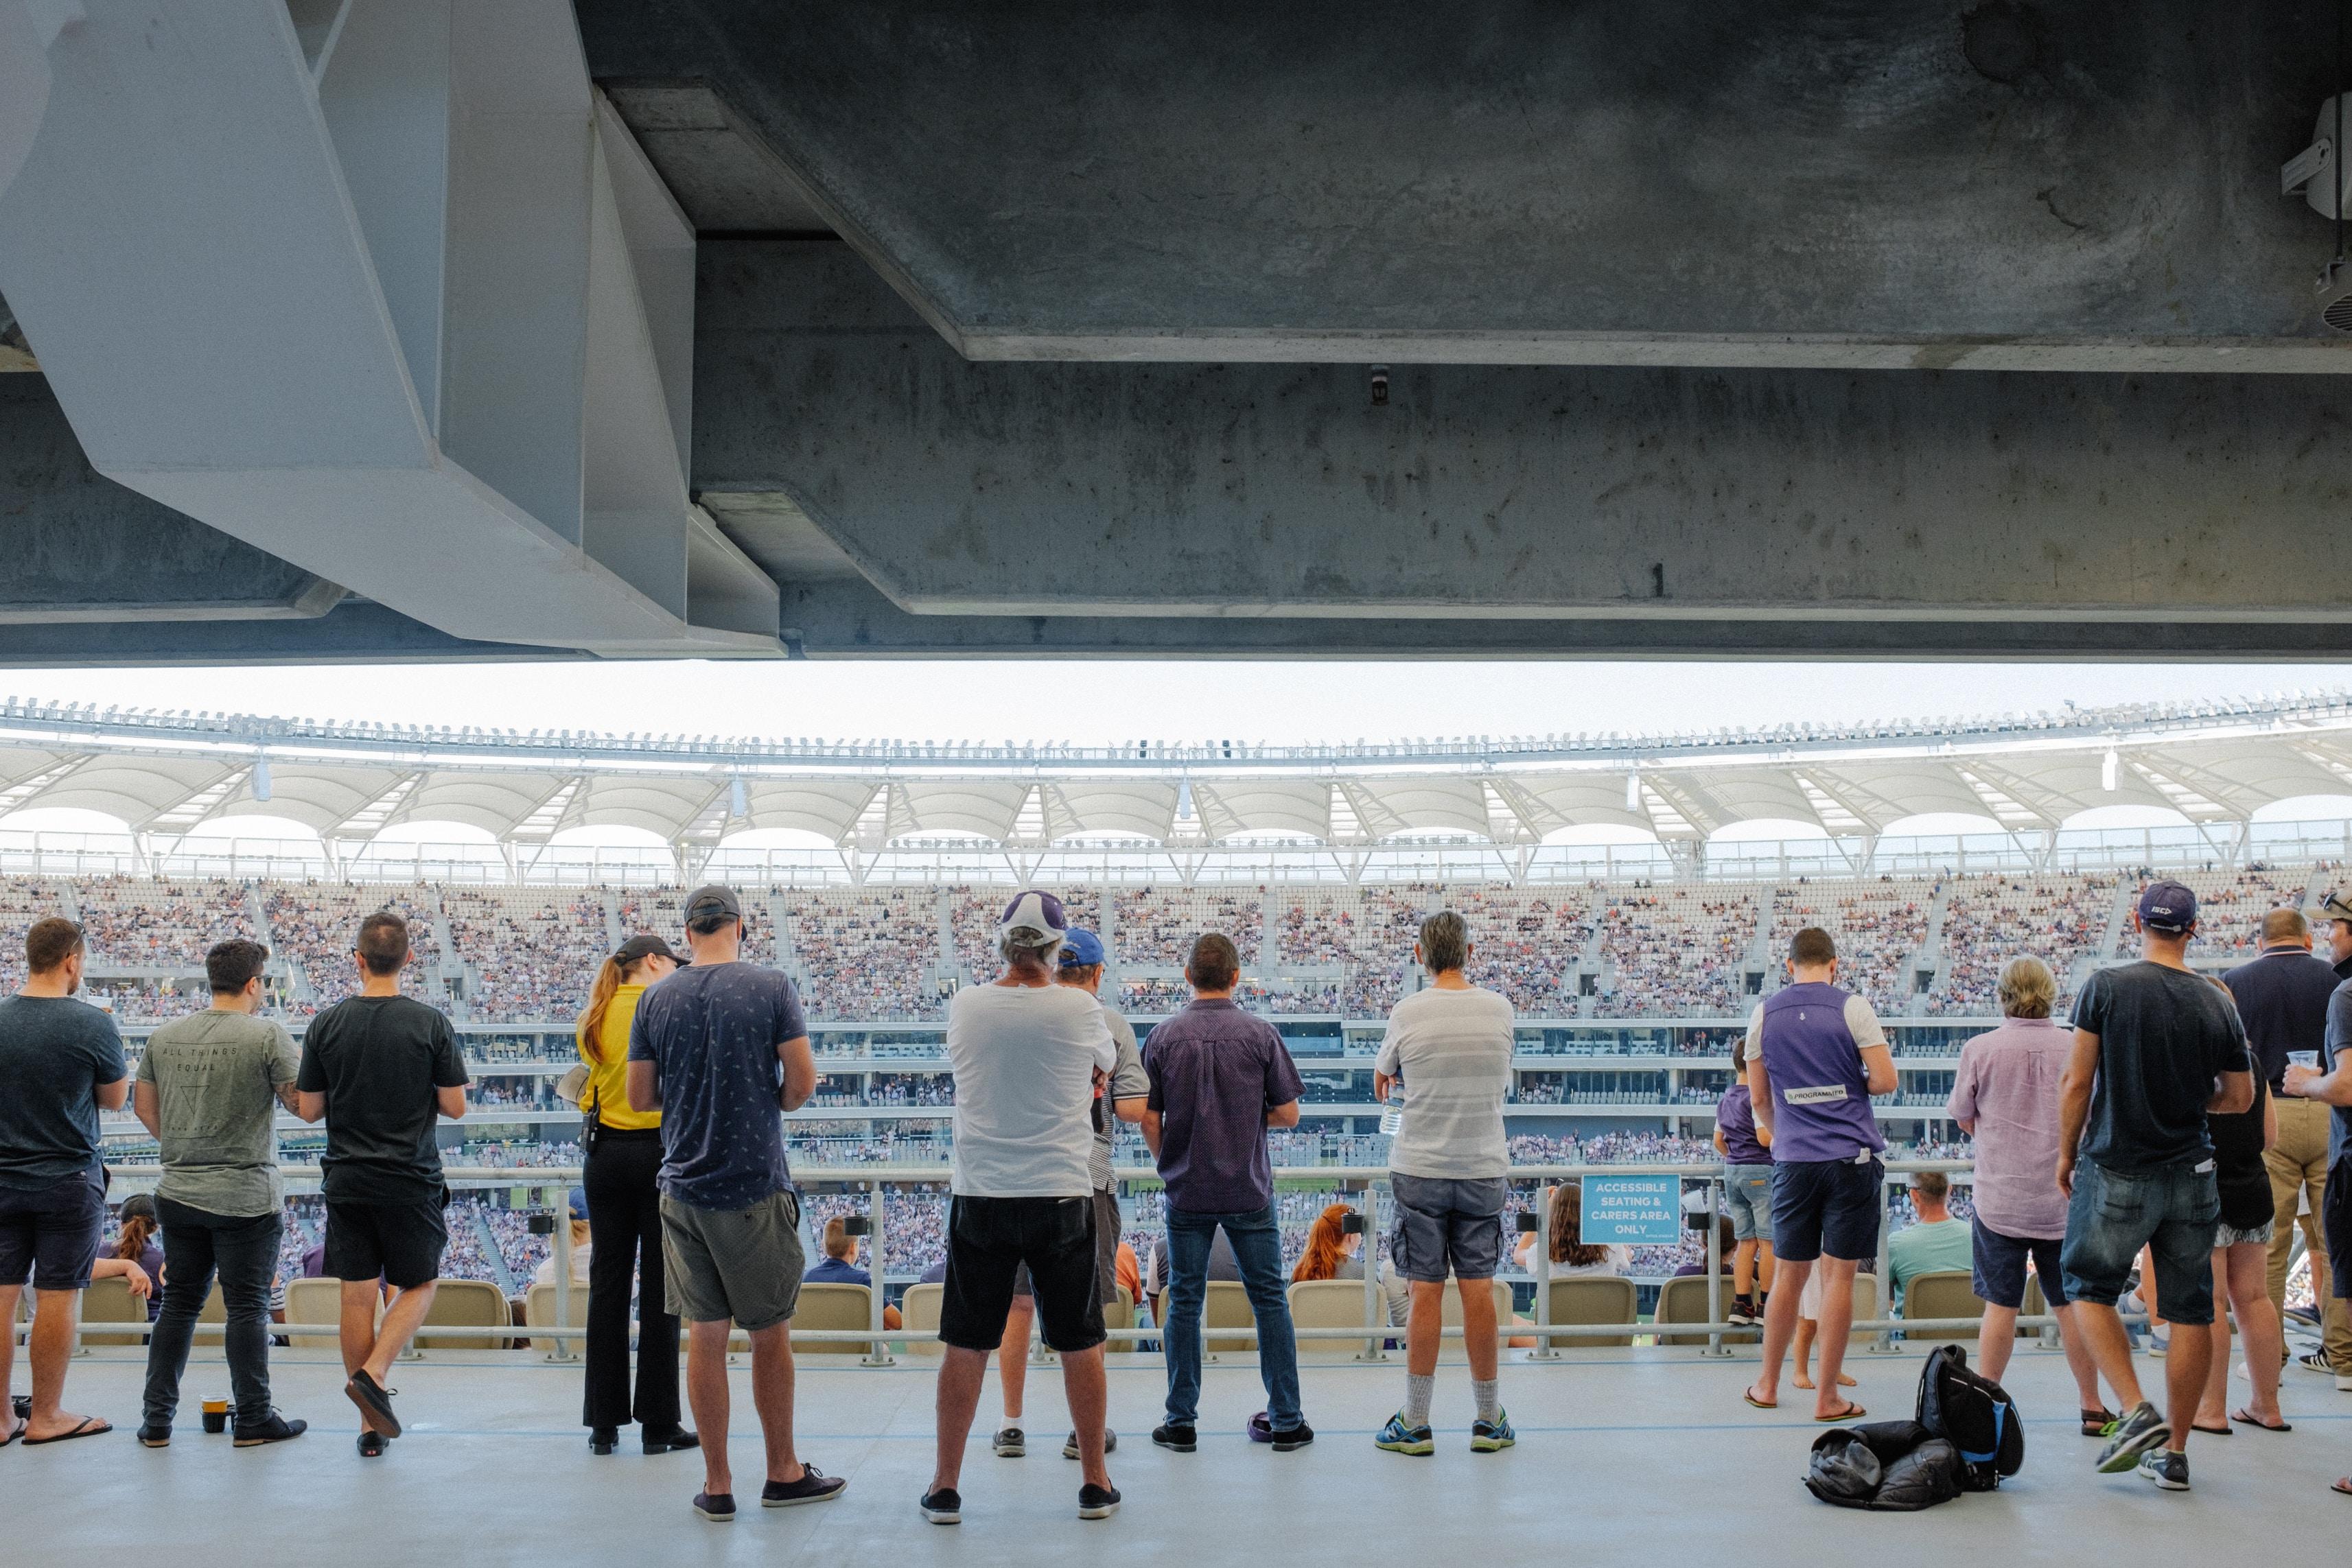 people standing on stadium